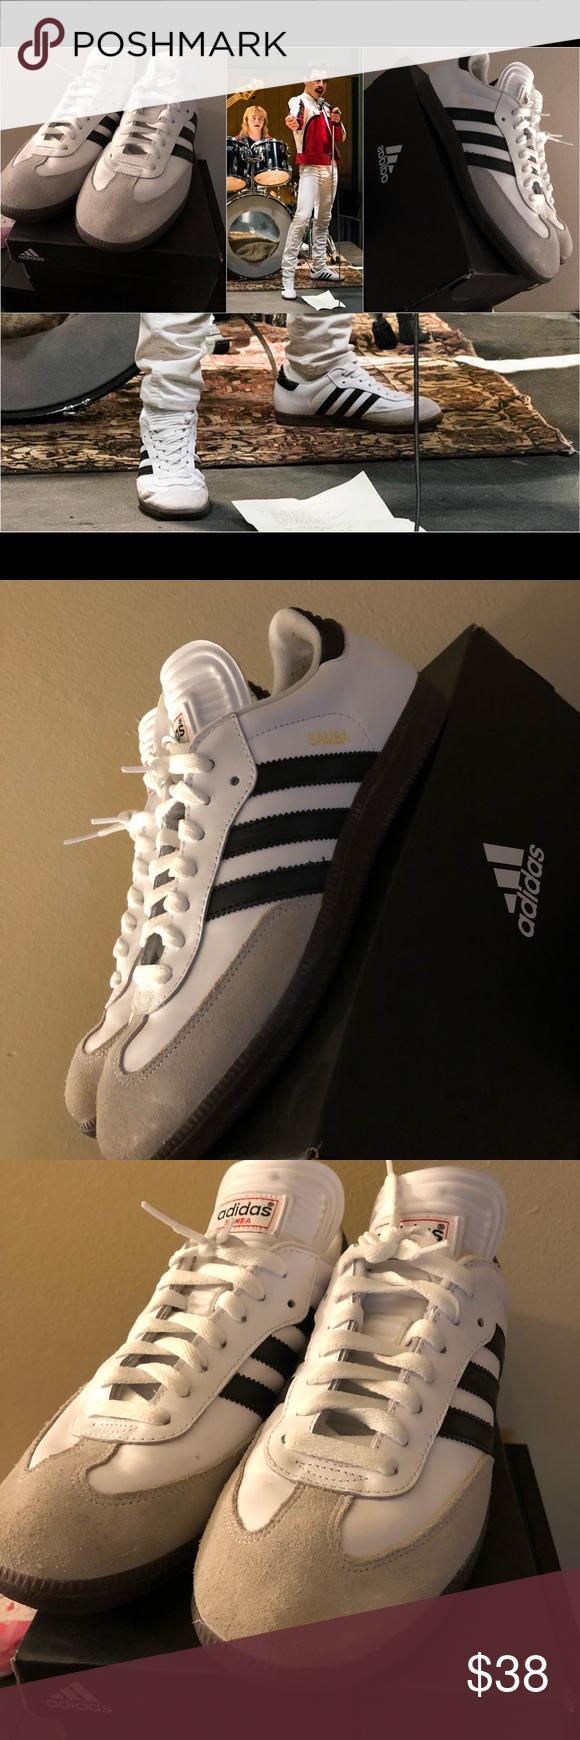 Oír de Seleccione Fiordo  Adidas Sambas Classic | Adidas samba white, Sambas, Adidas samba